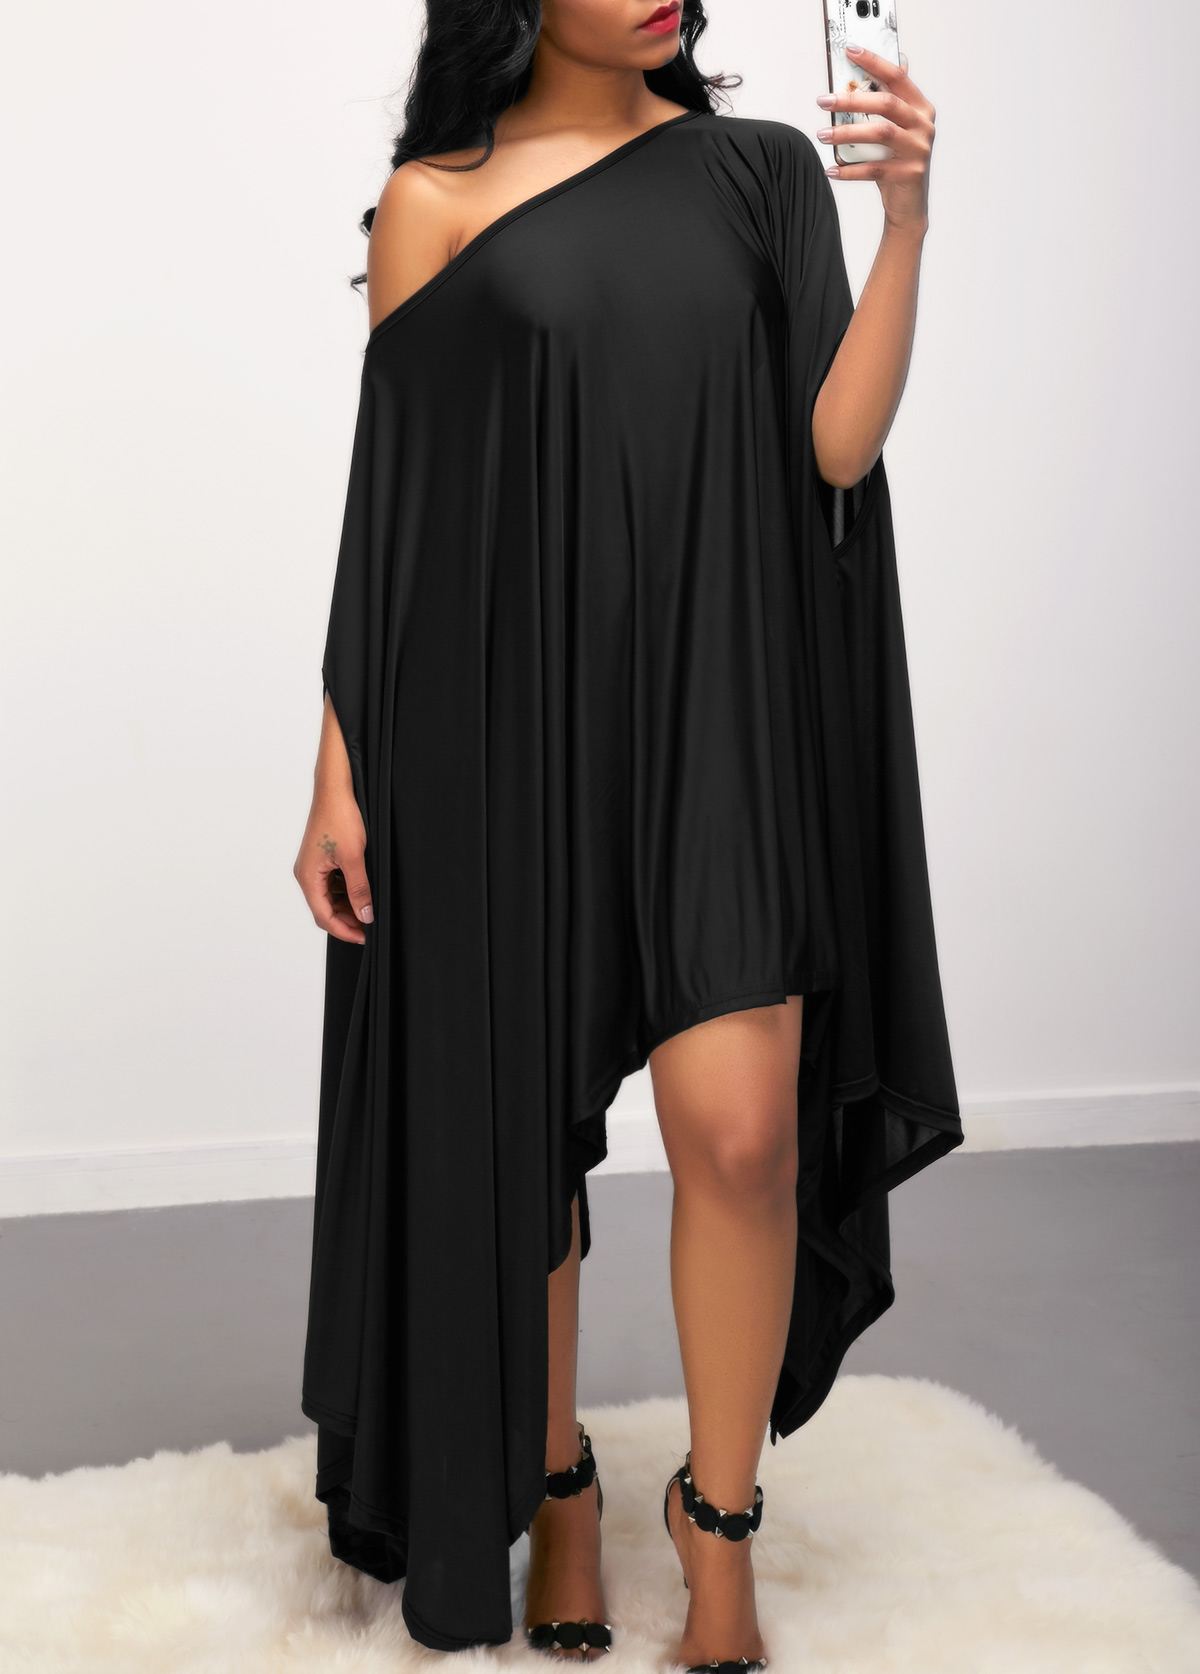 Skew Neck Batwing Sleeve Asymmetric Hem Black Dress